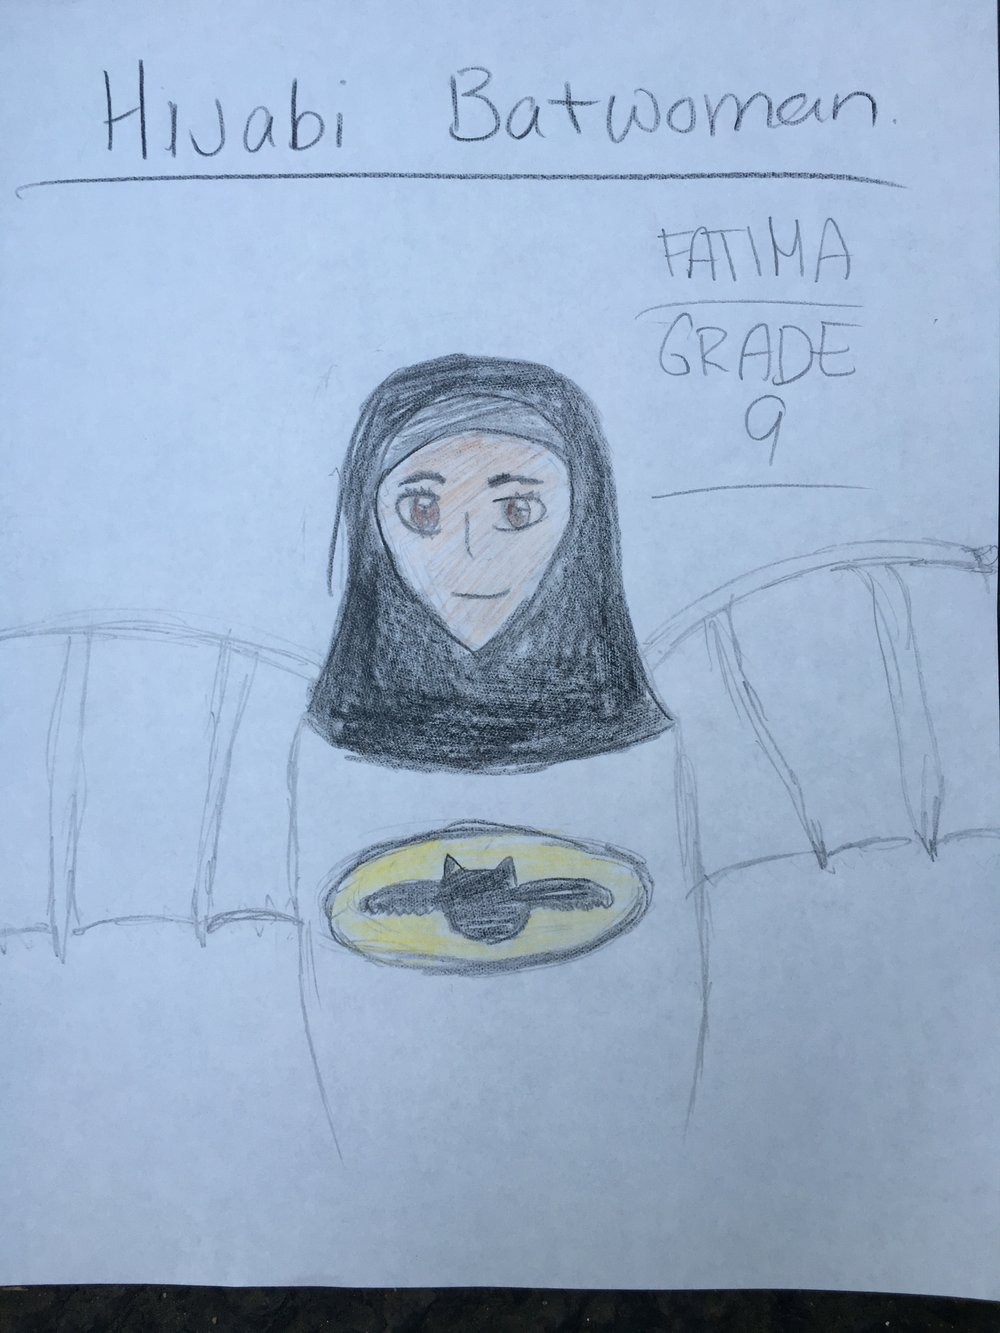 BatwomanHijab.JPG